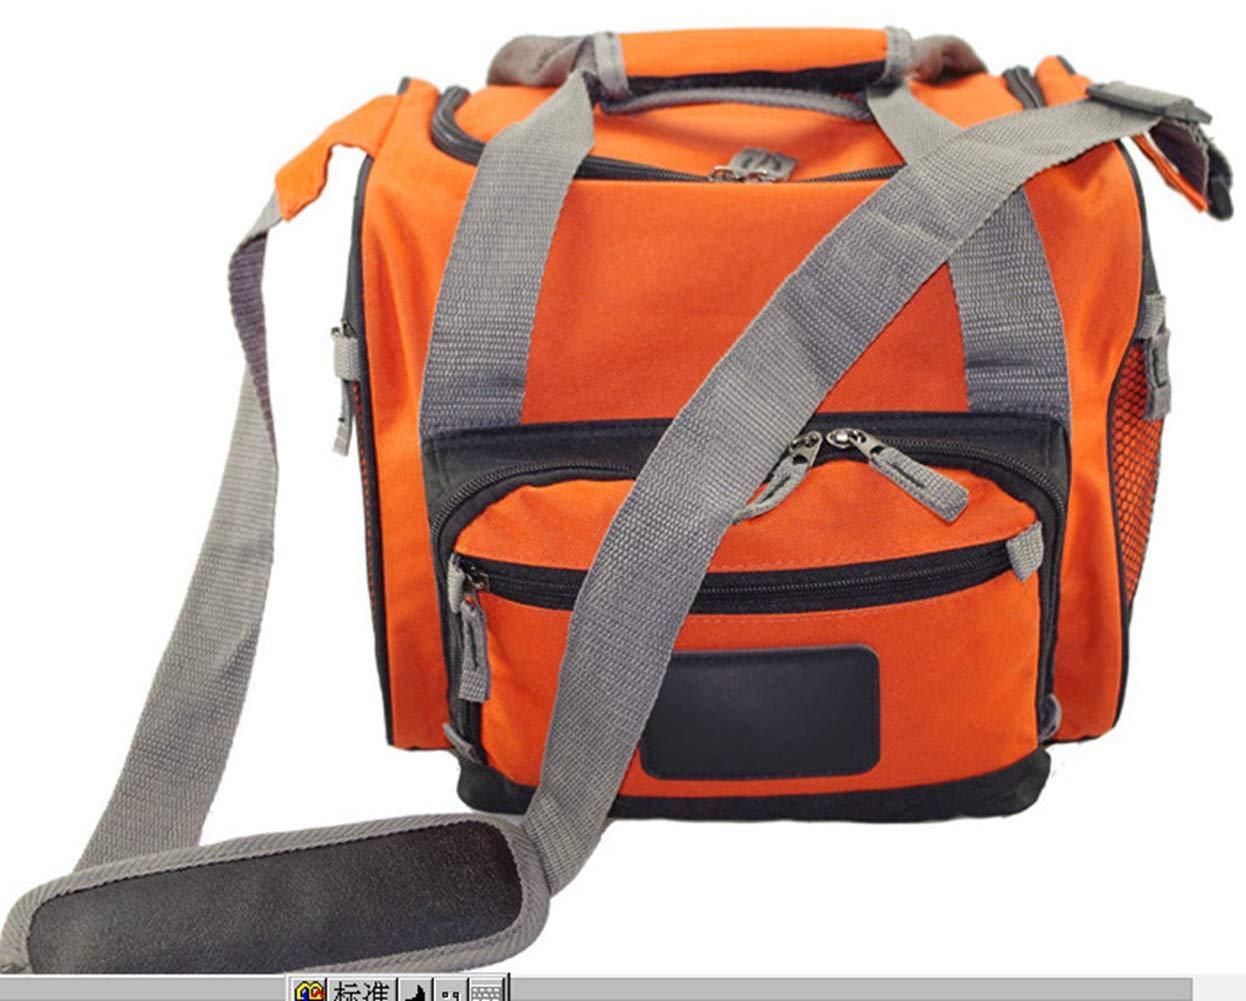 SYHK Picnic Box Oxford Big Capacity Waterproof Cooler Bag Insulated Cool Shoulder Bag Ice Pack